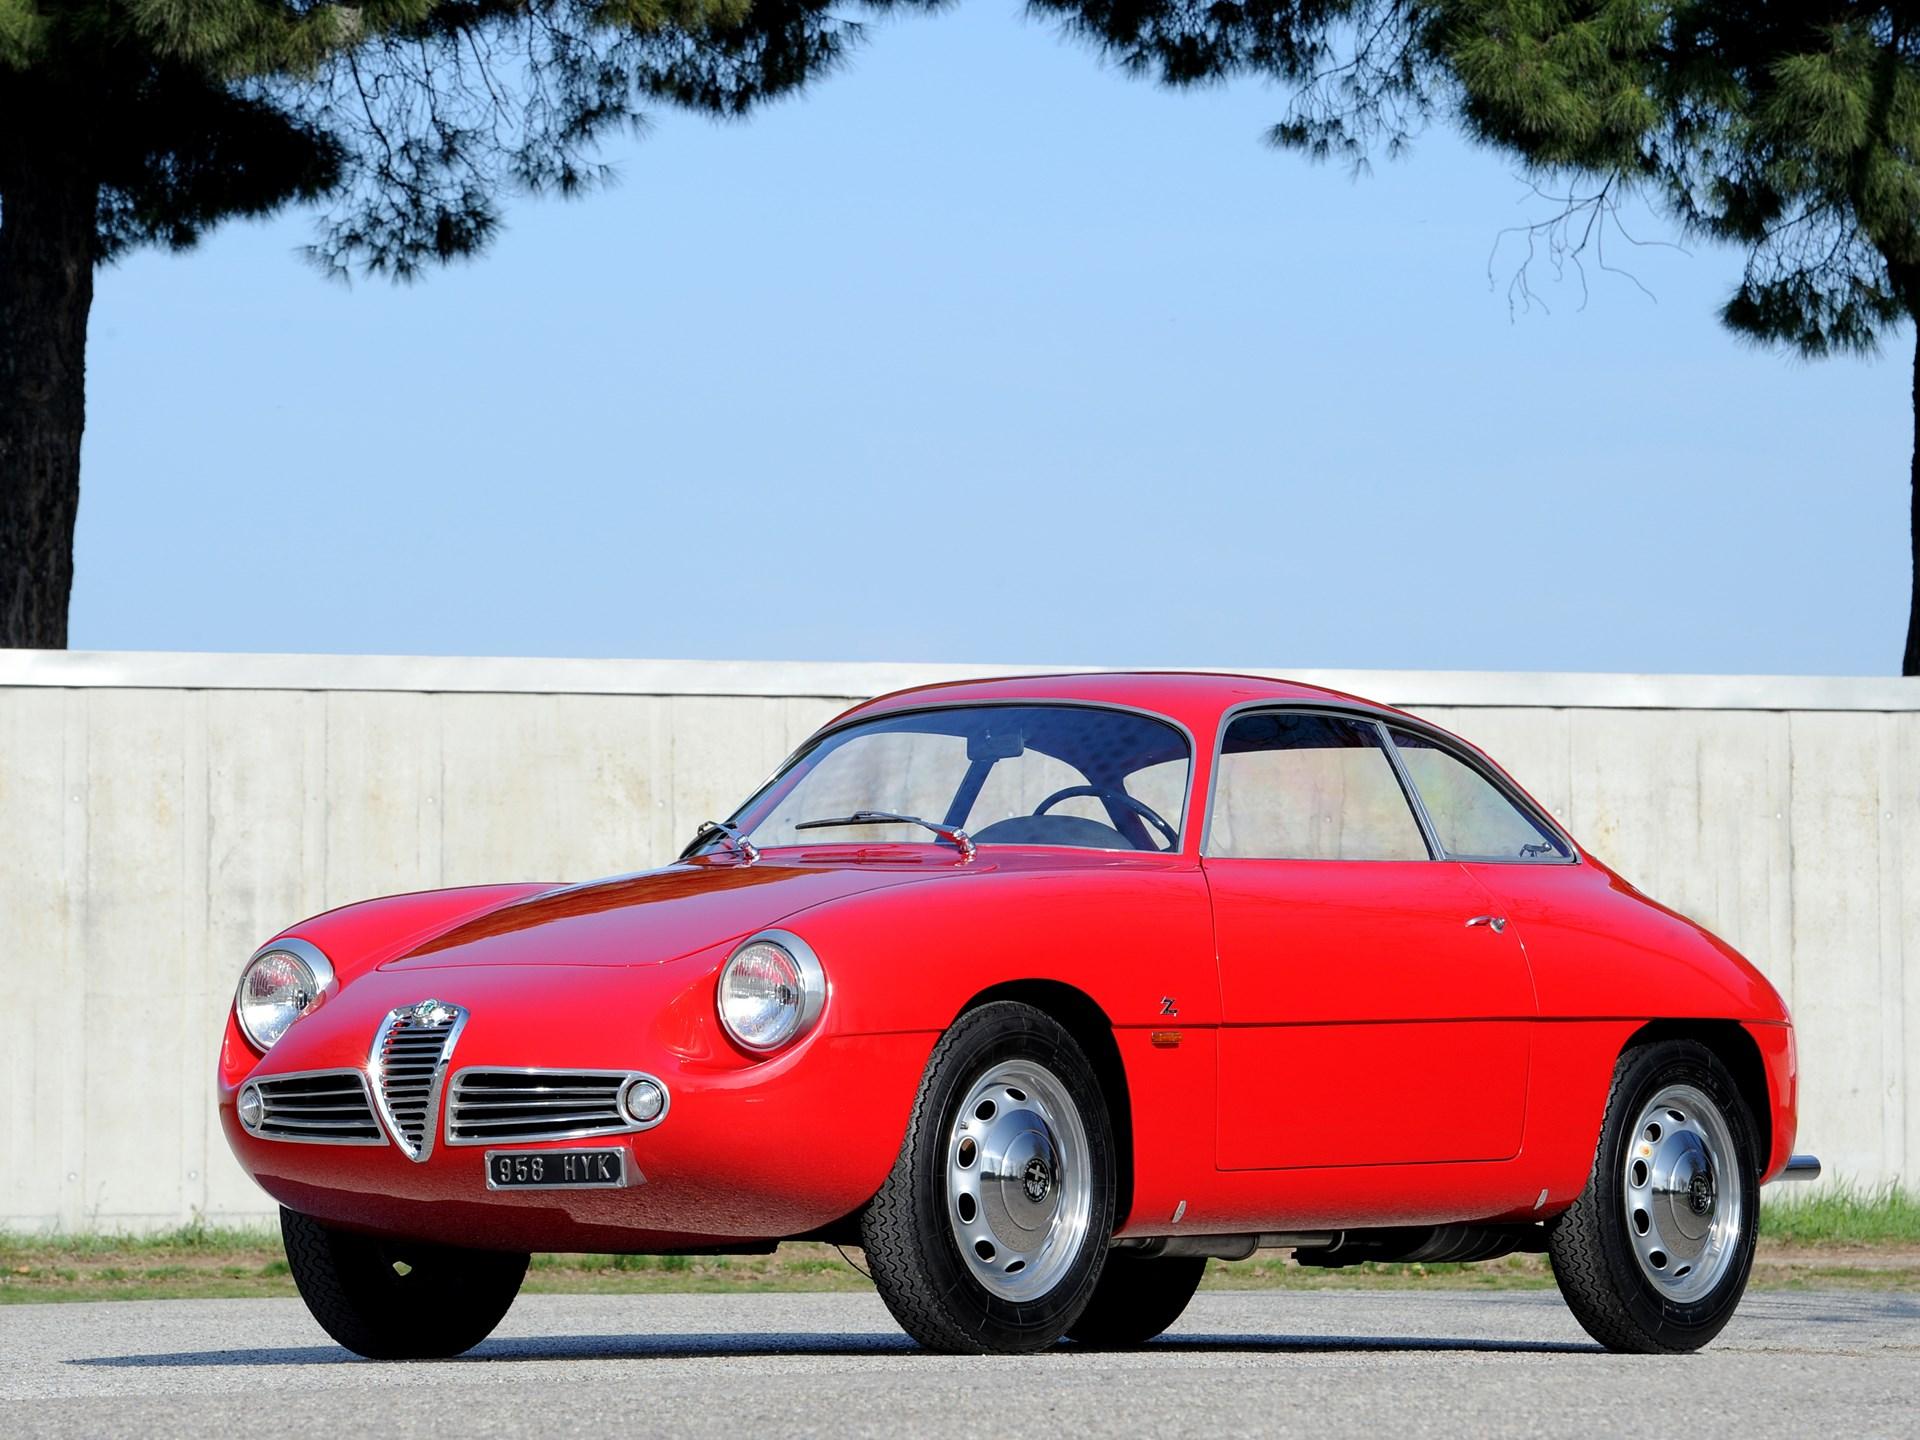 RM Sothebys Alfa Romeo Giulietta Sprint Zagato Coda Tonda - Alfa romeo giulietta 1960 for sale